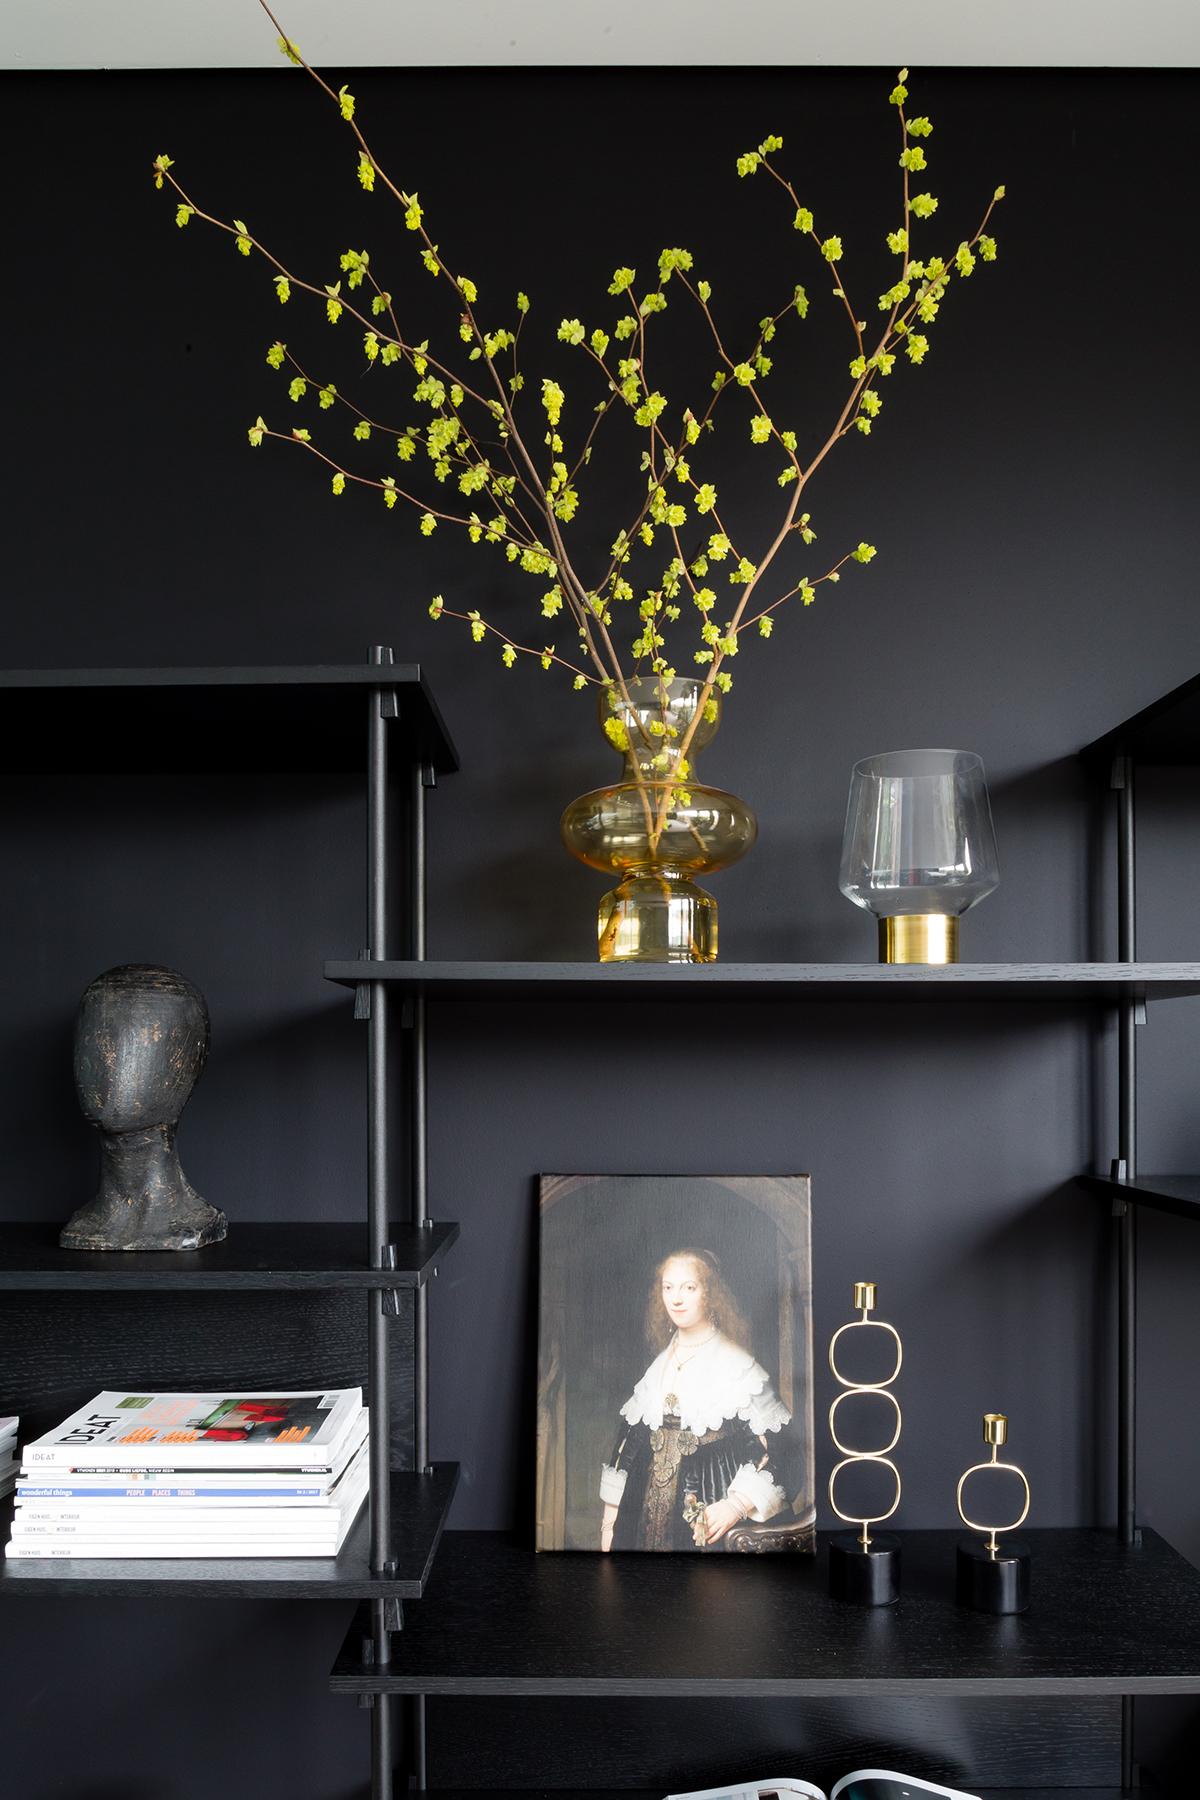 zwarte wand decoratie groene plant Flexa kleurtester